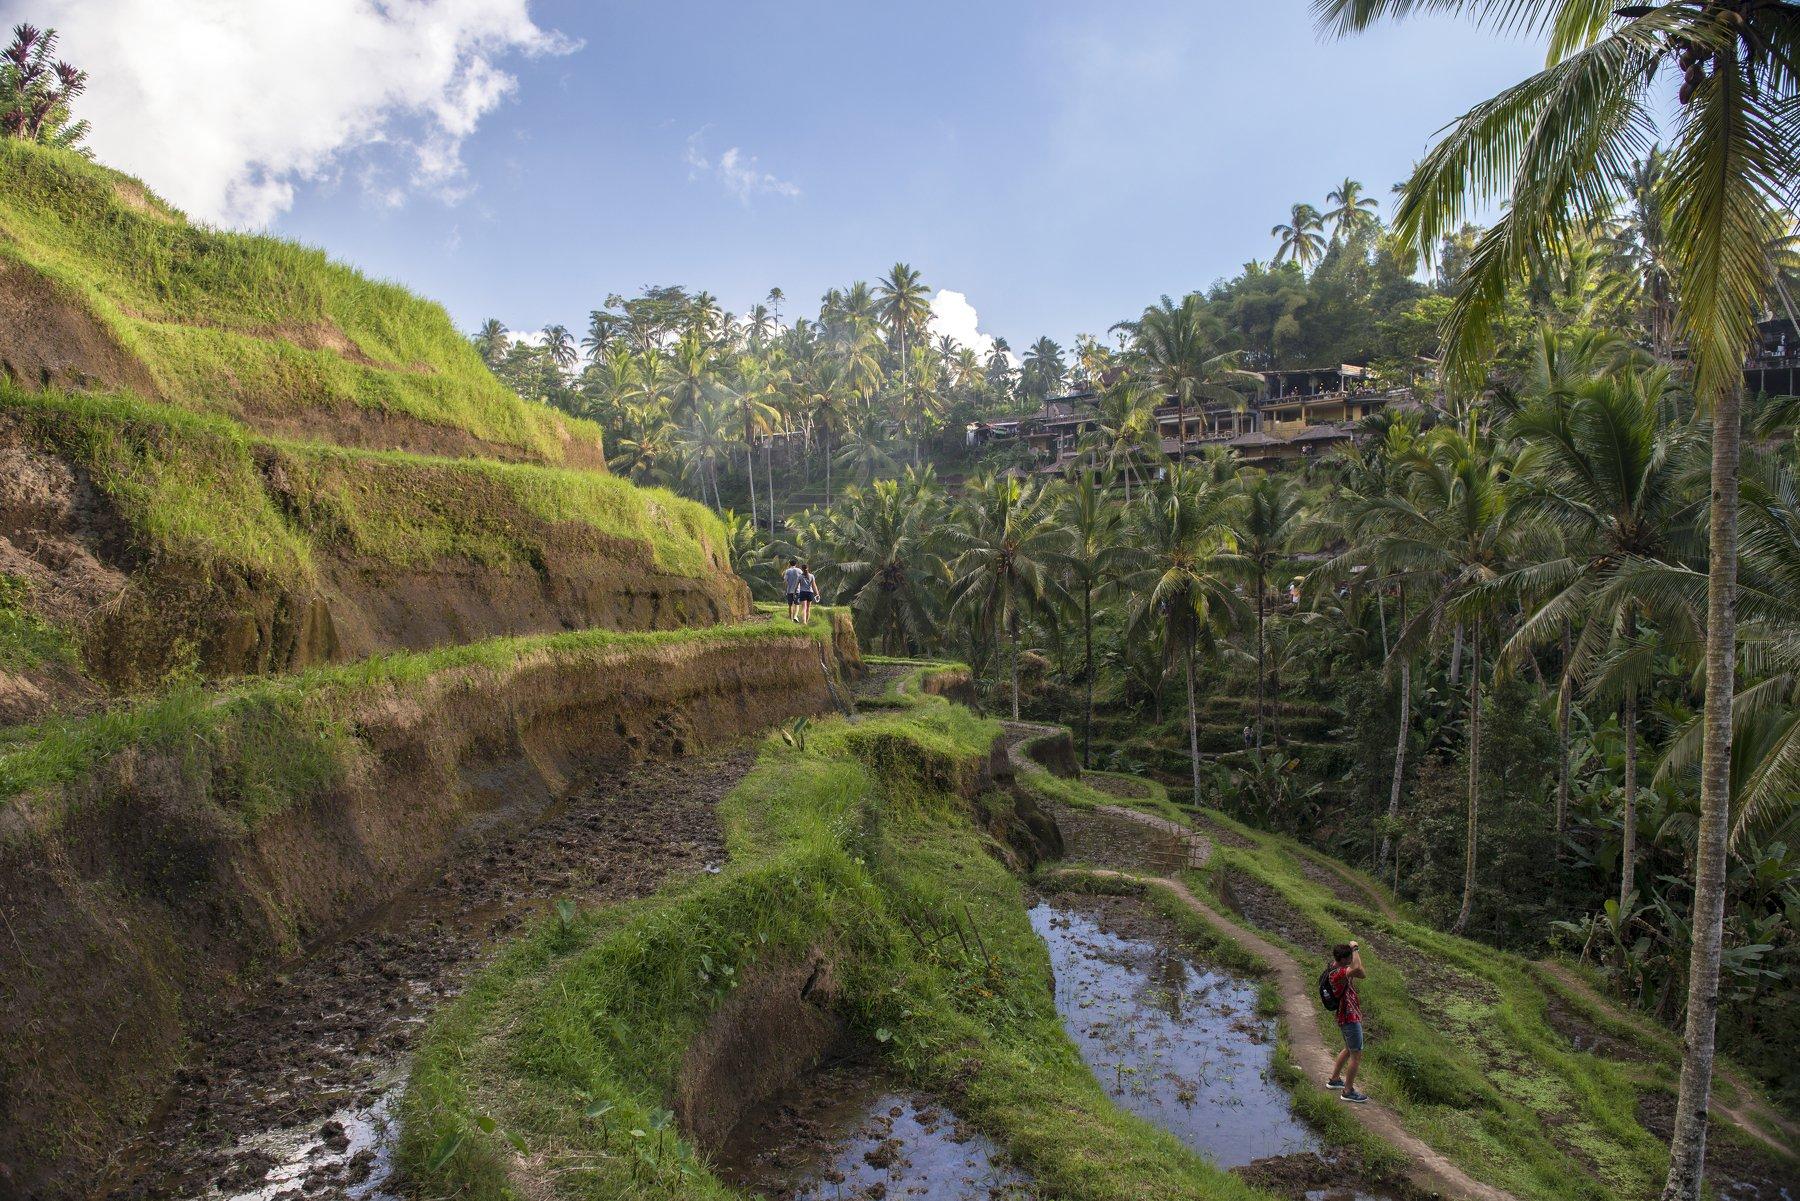 Бали, Индонезия, рис, террасы, экзотика, тропики, фермер, туристы, отдых, путешествие, Тегаллаланг, Марина Мудрова